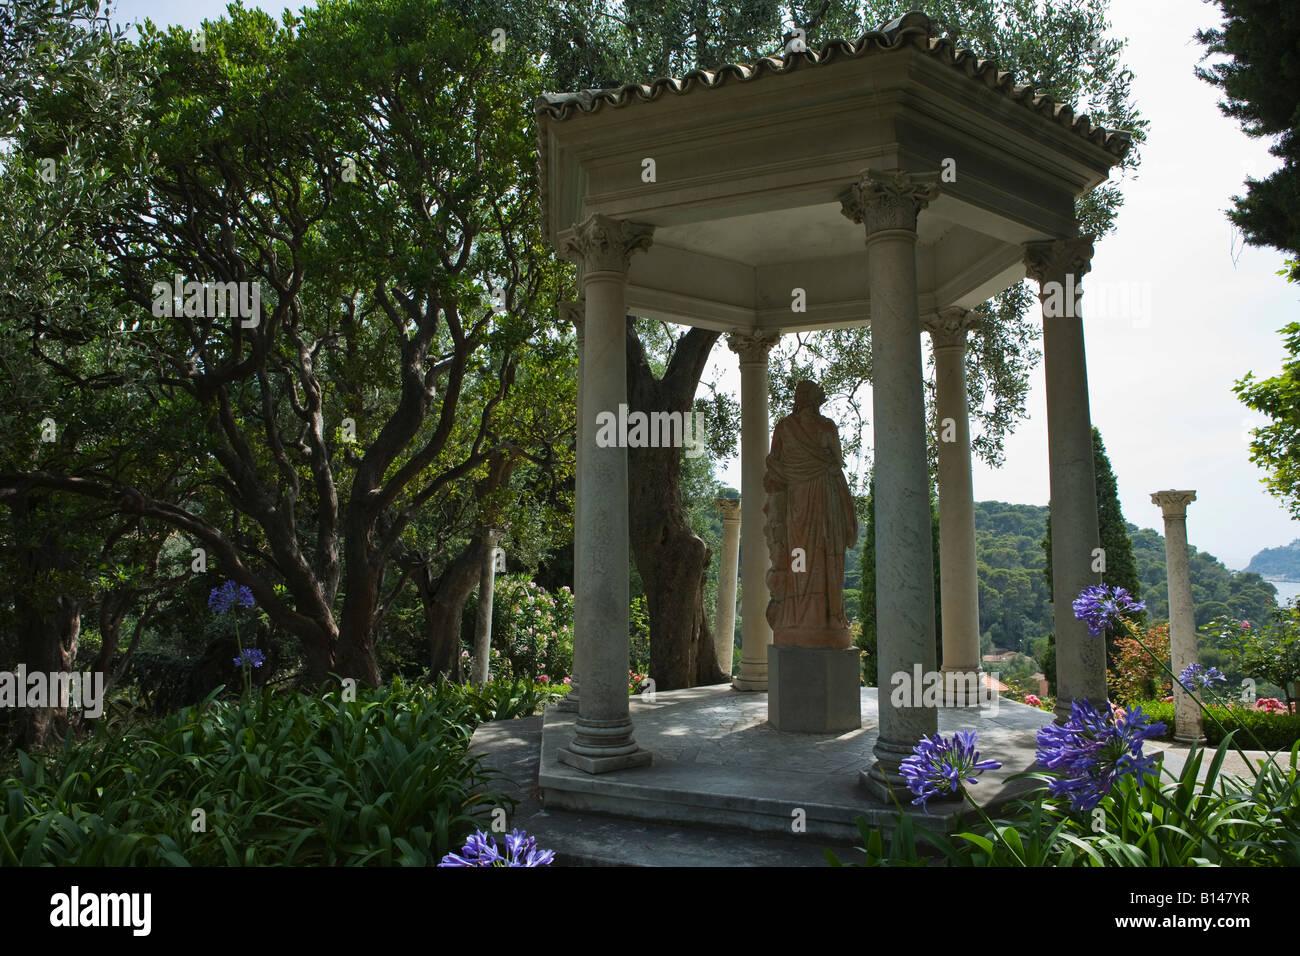 Villa Ephrussi de Rothschild, Cap ferrat, France. - Stock Image